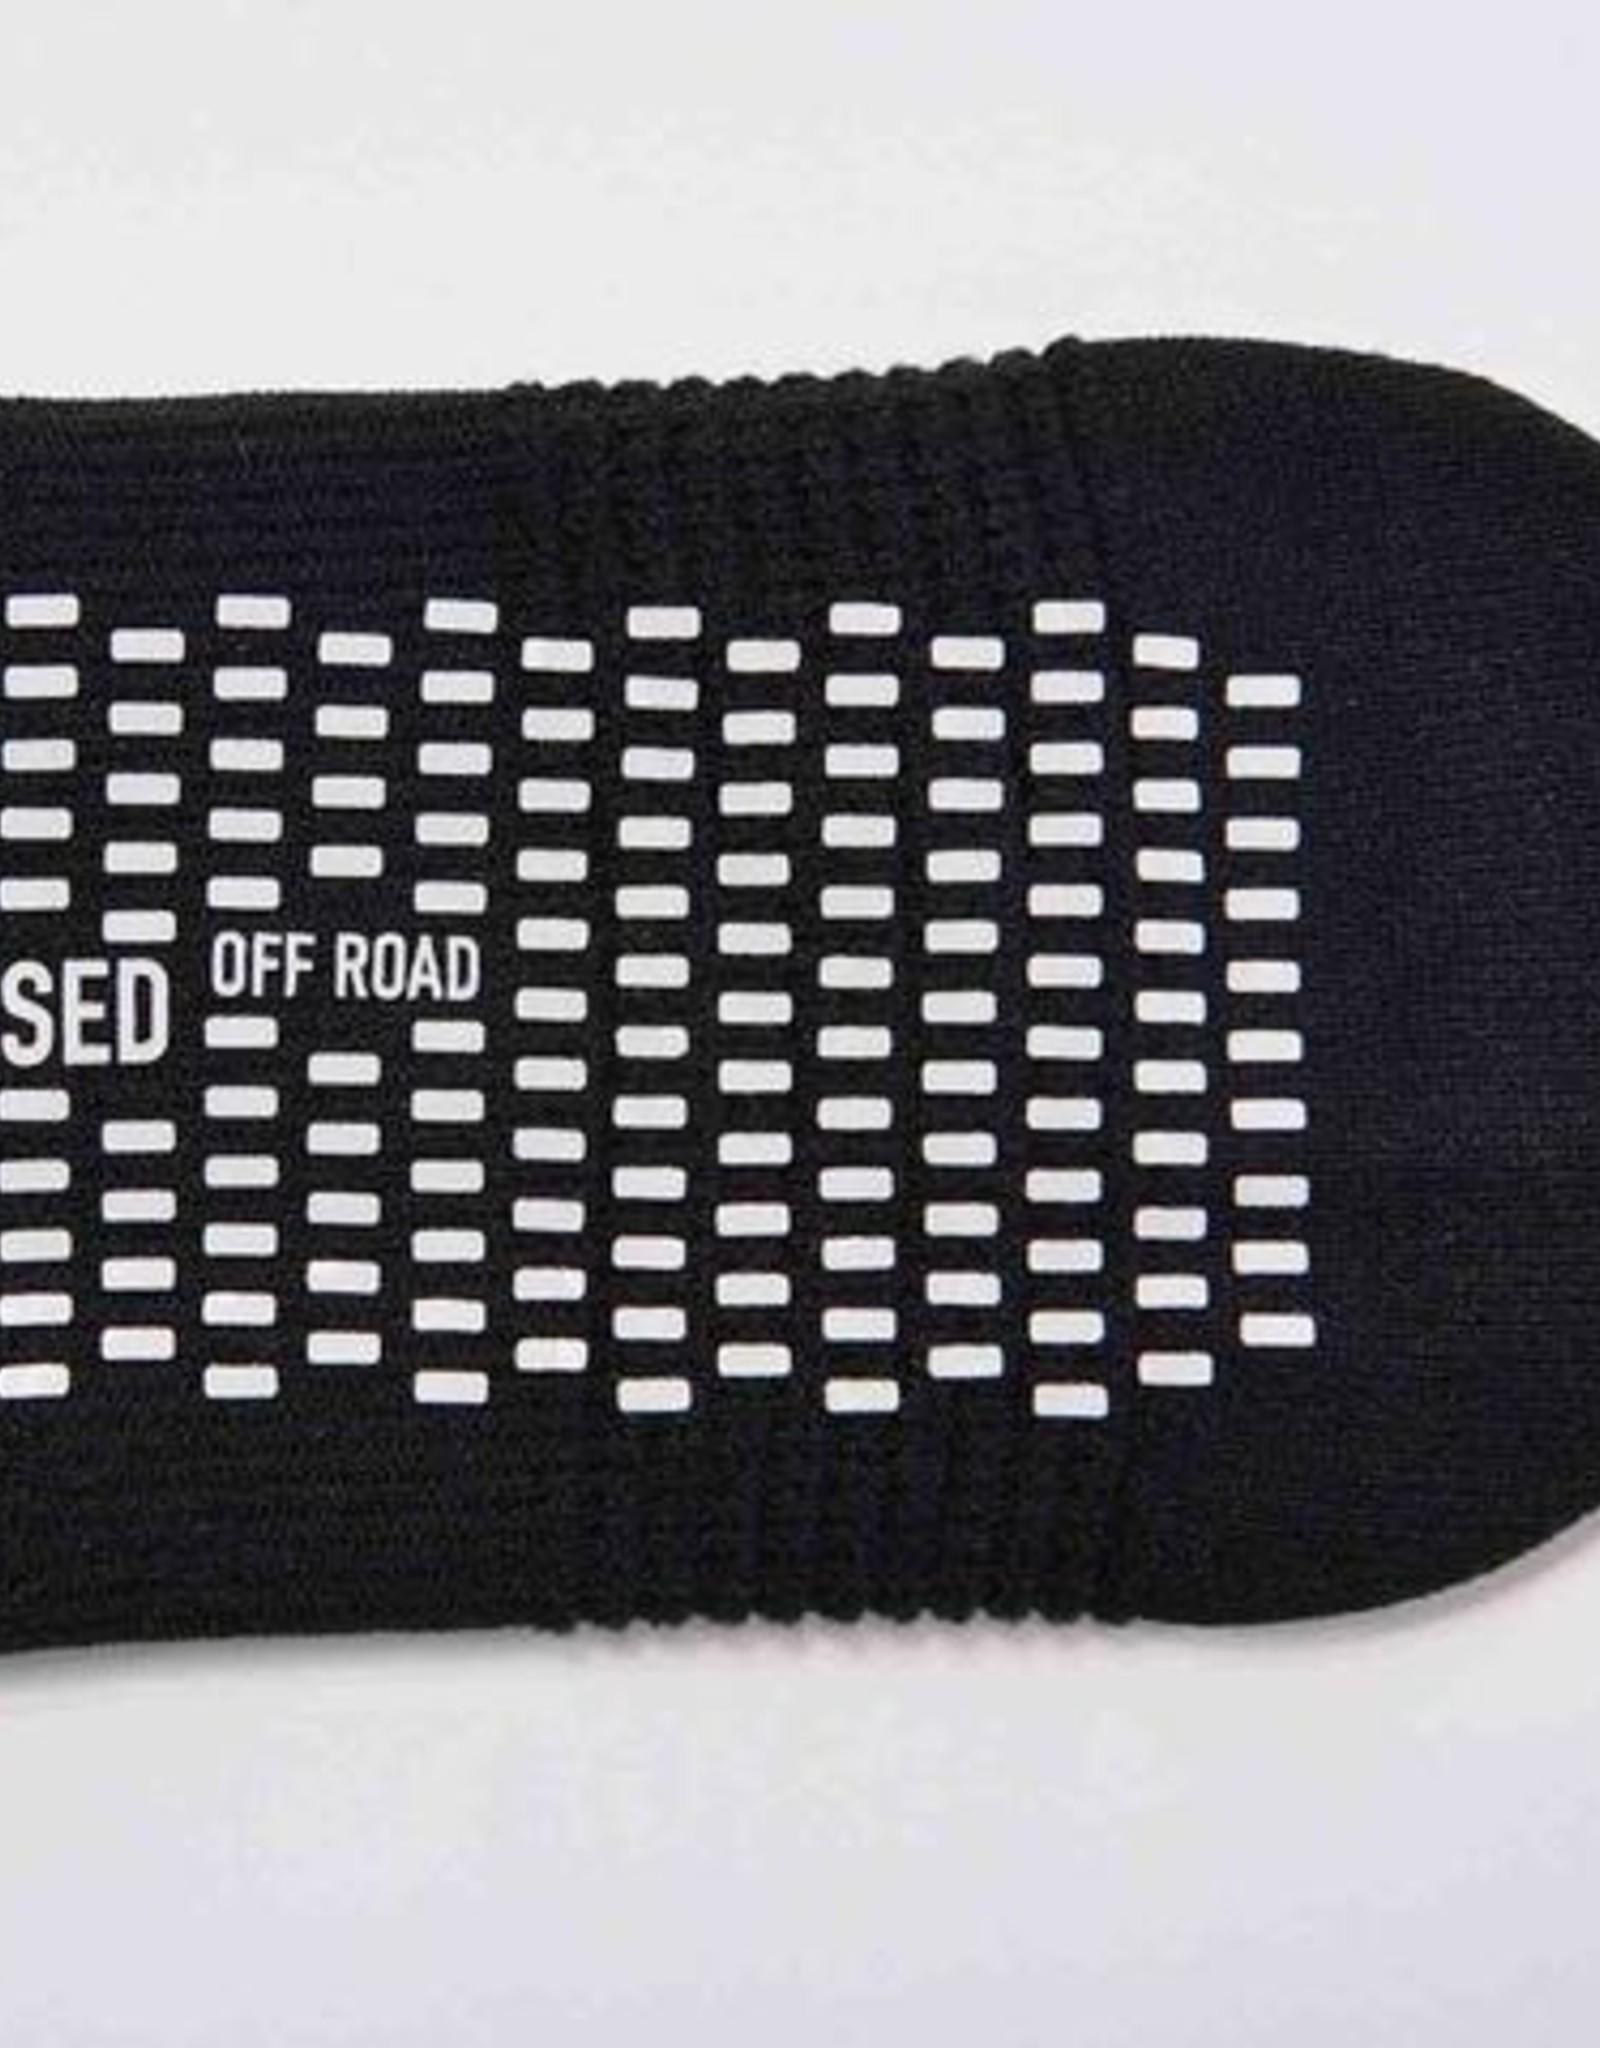 Fingerscrossed Off Road Fietssokken - Zwart